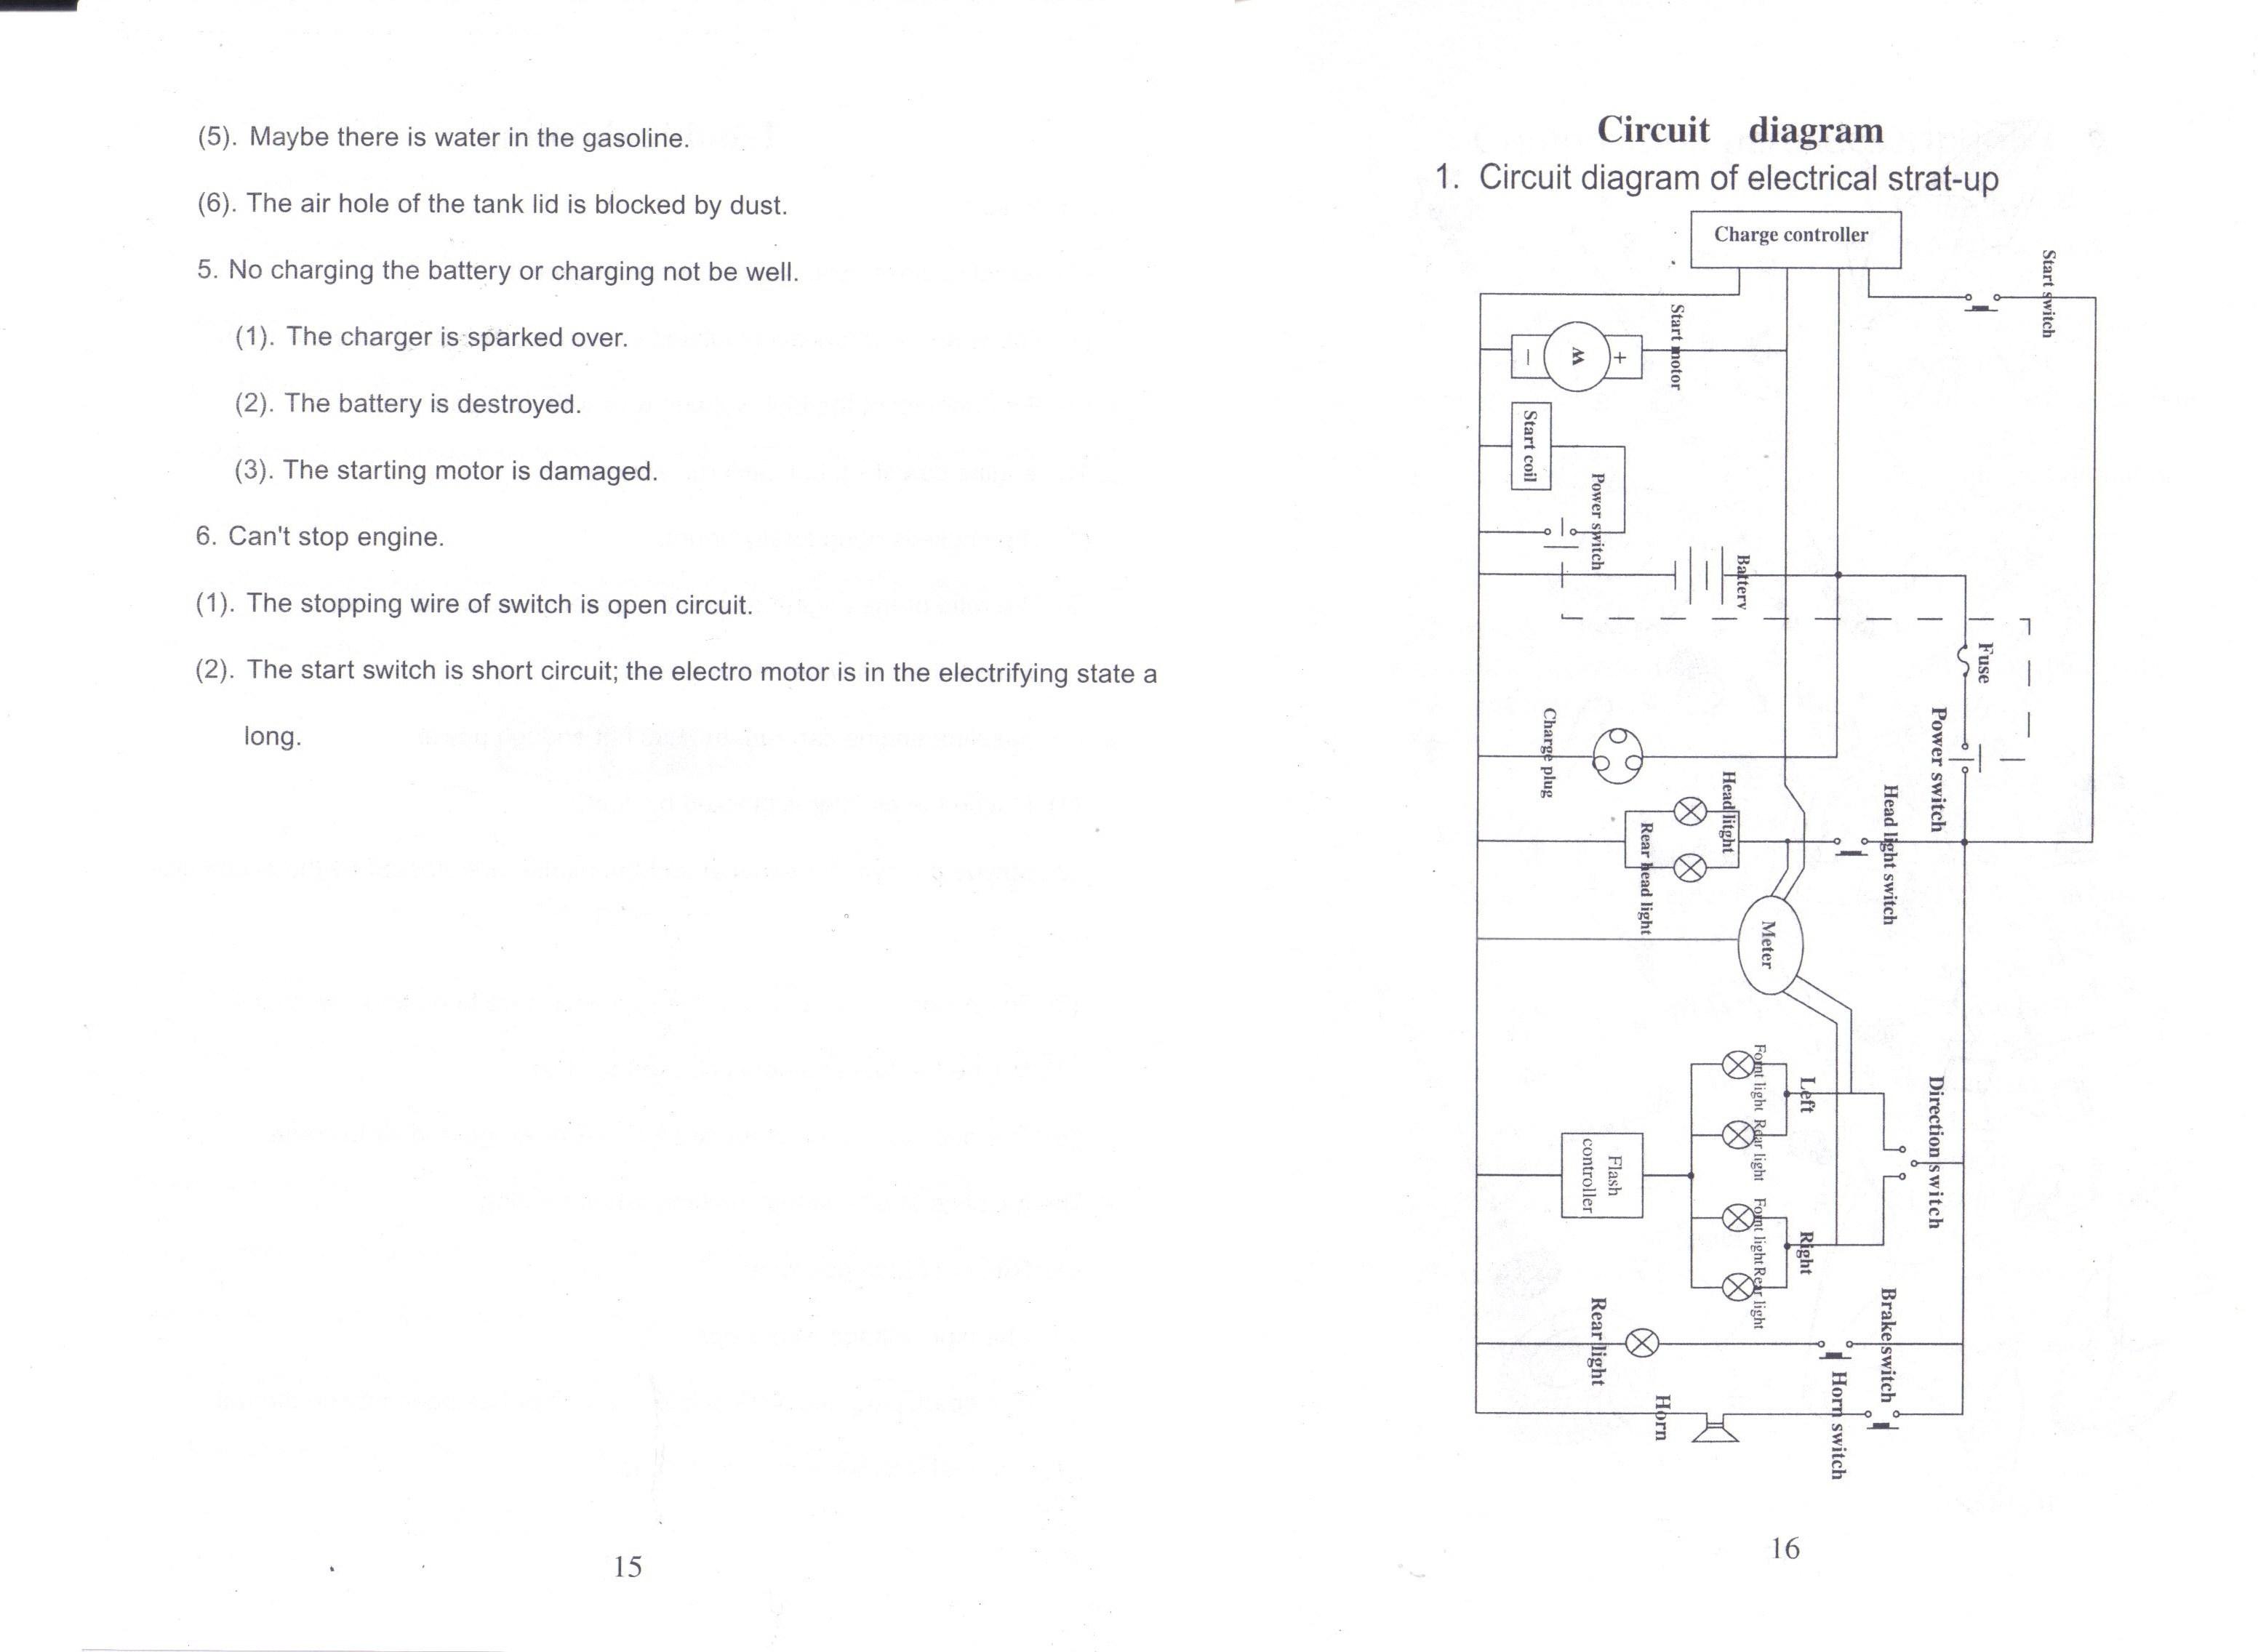 xtreme 90cc atv wiring diagram sk 4485  wiring diagram in addition 2001 polaris sportsman 90  wiring diagram in addition 2001 polaris